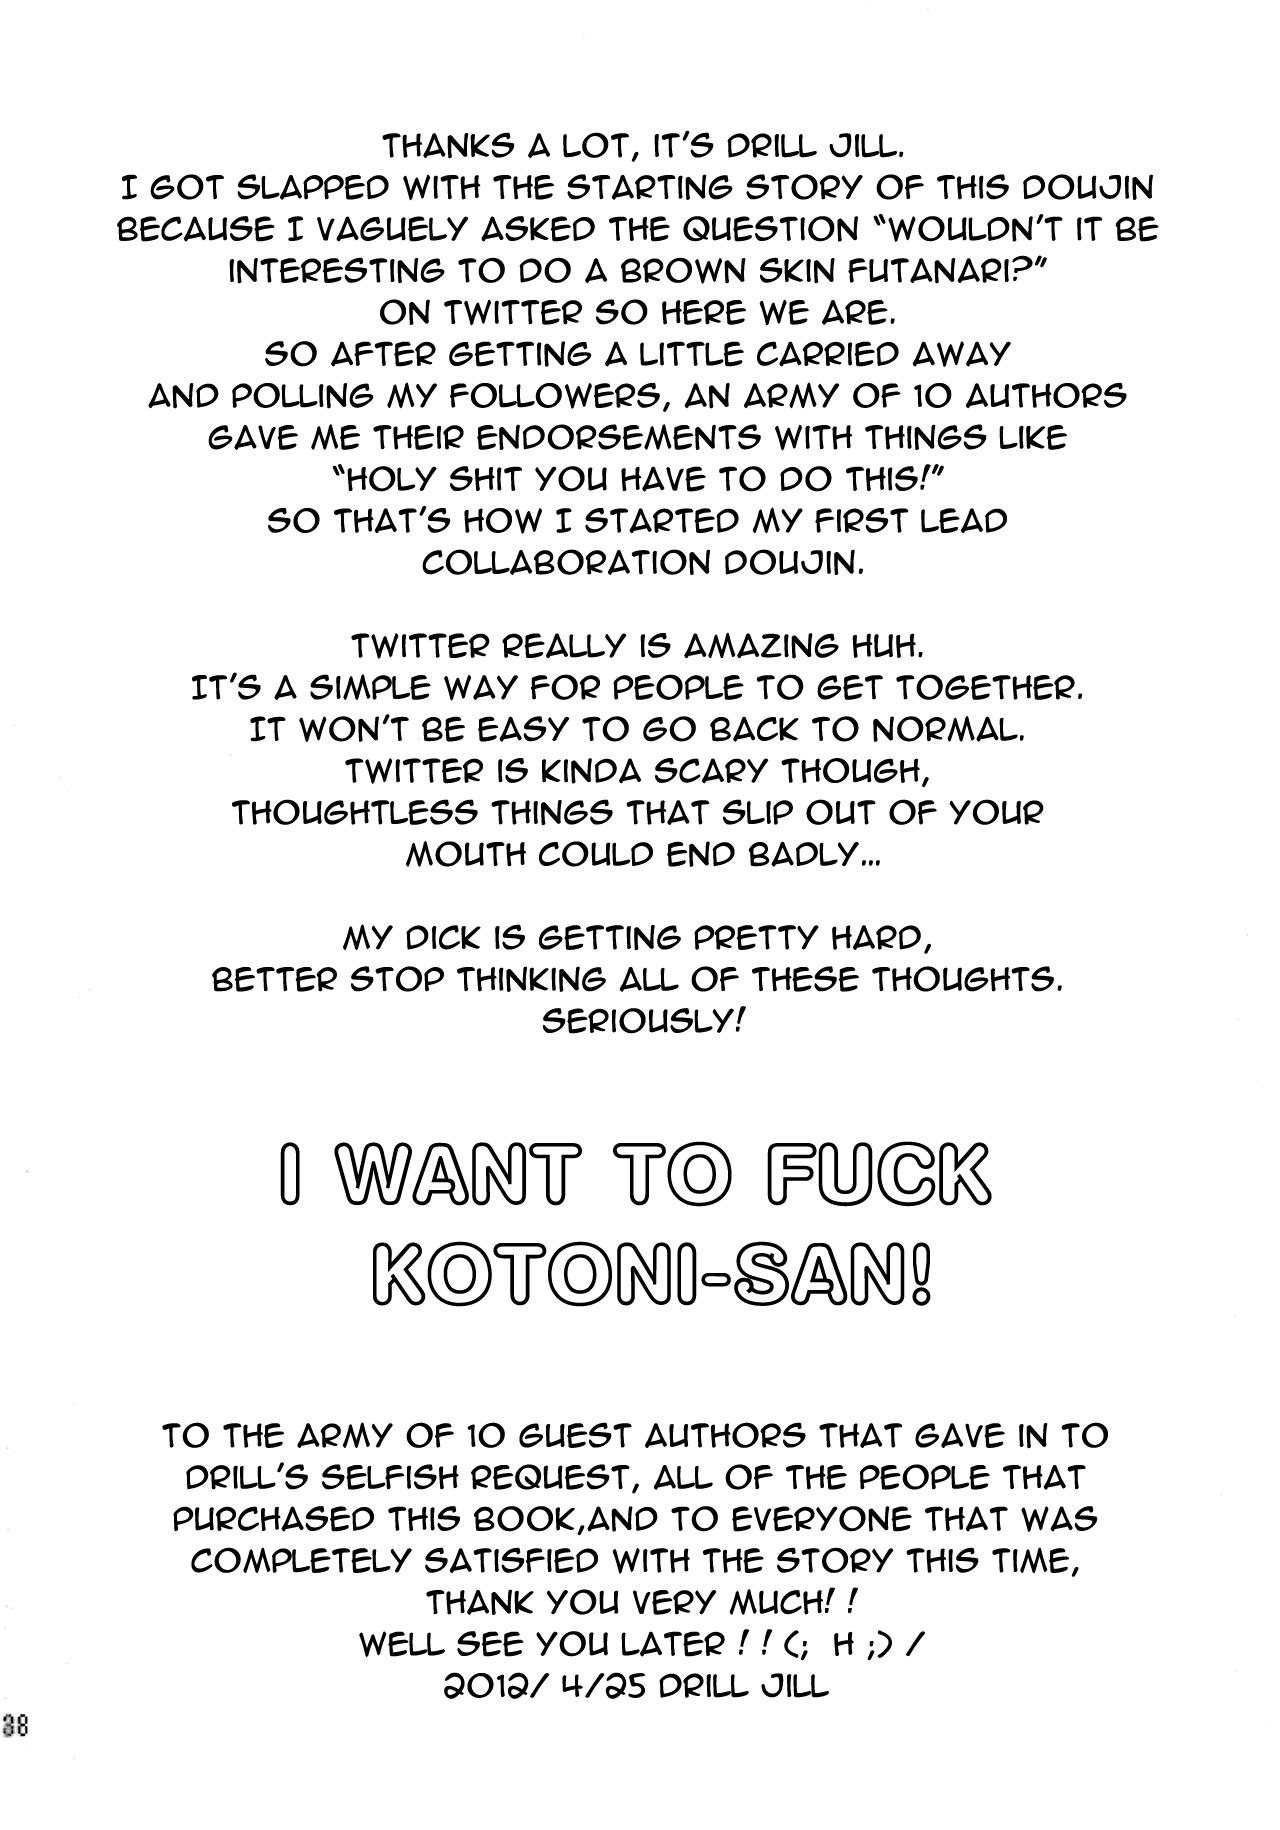 Kotoni-san wo ** Shitai! 37